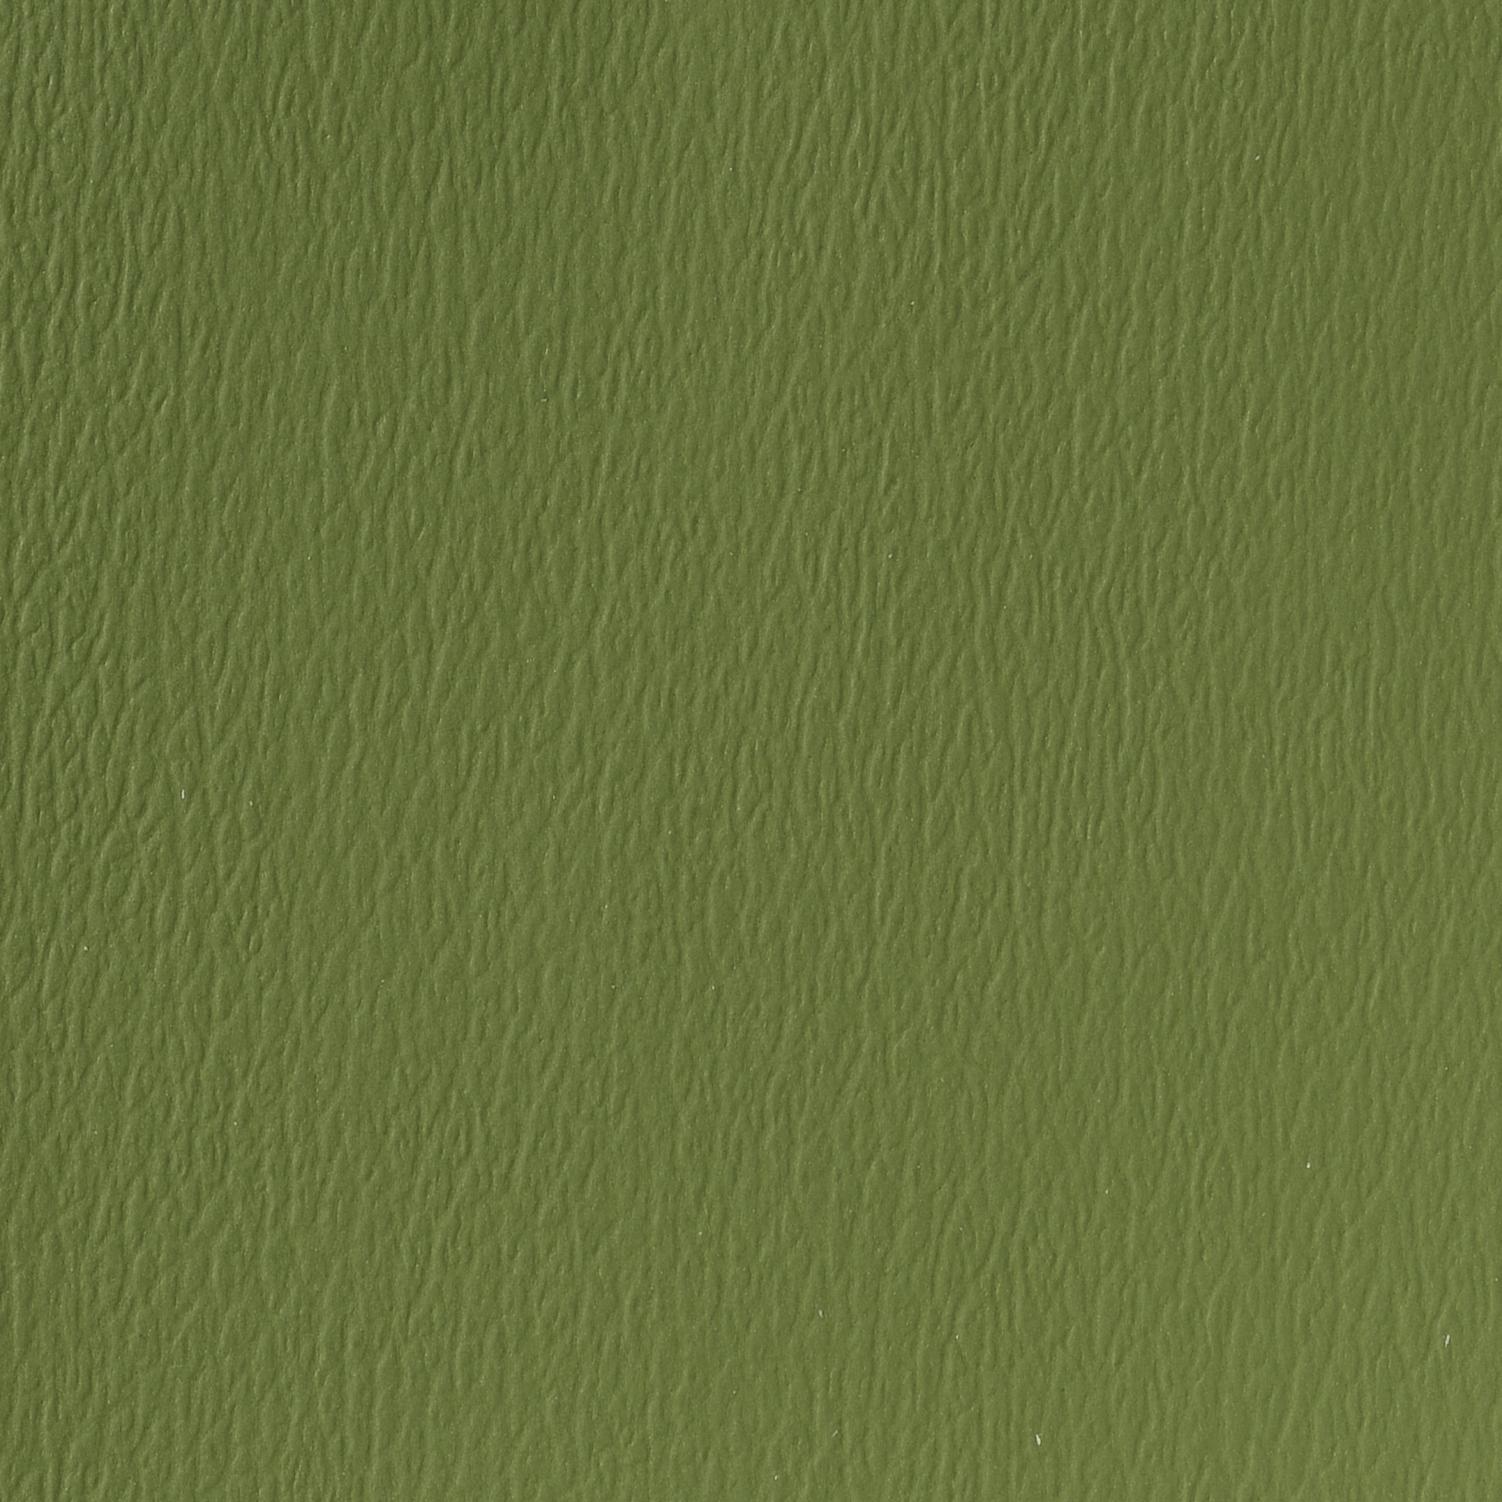 OLIVE GREEN   US-529